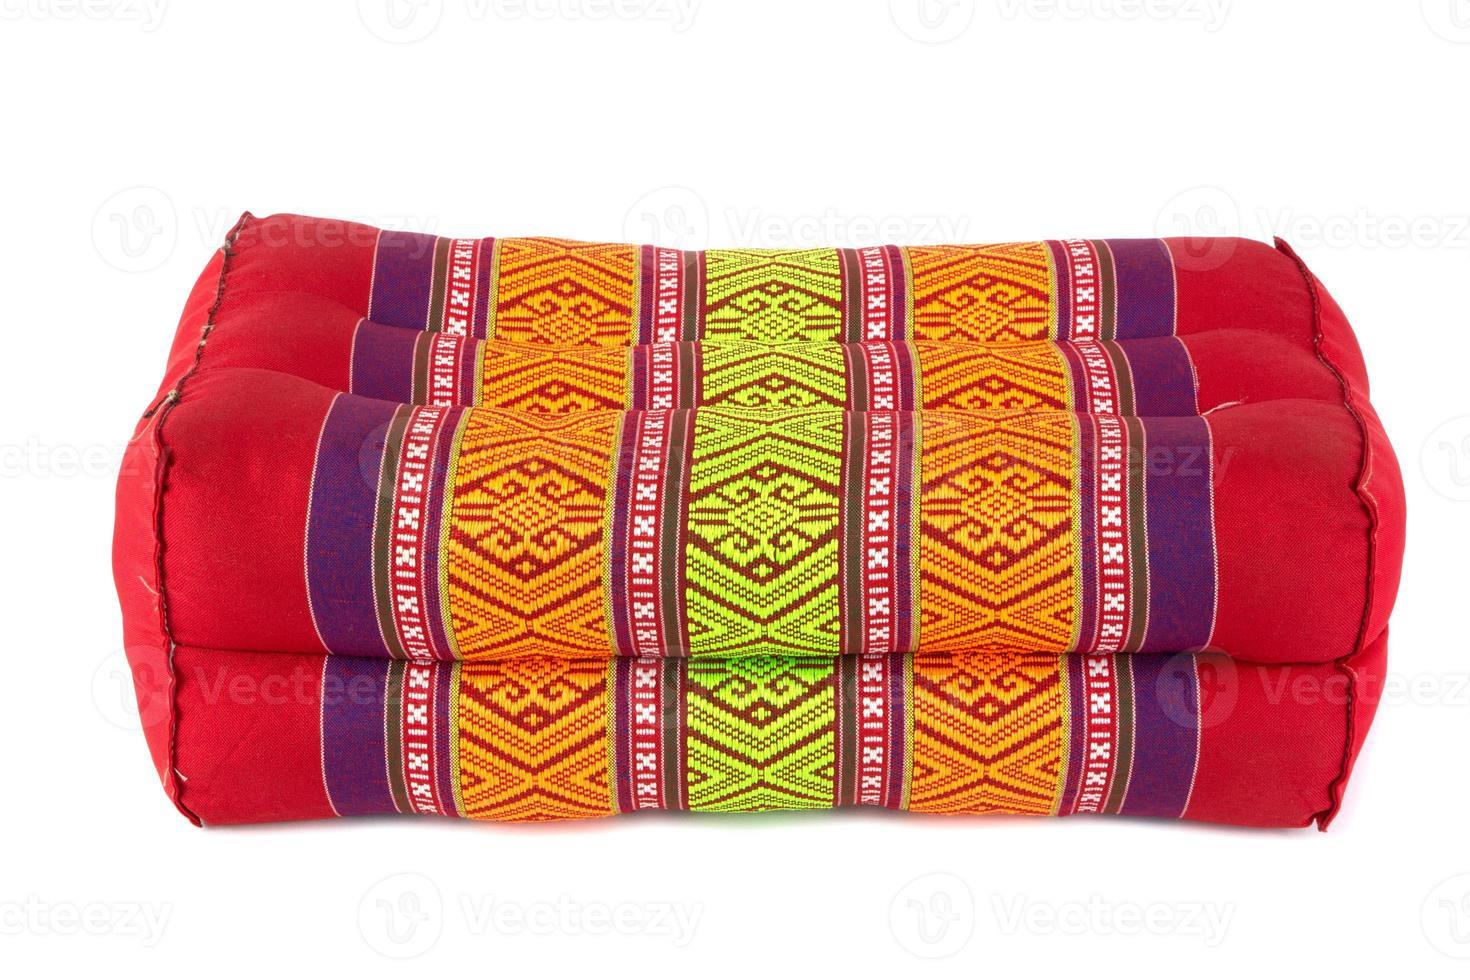 travesseiro retangular como estilo tailandês, fundo branco foto